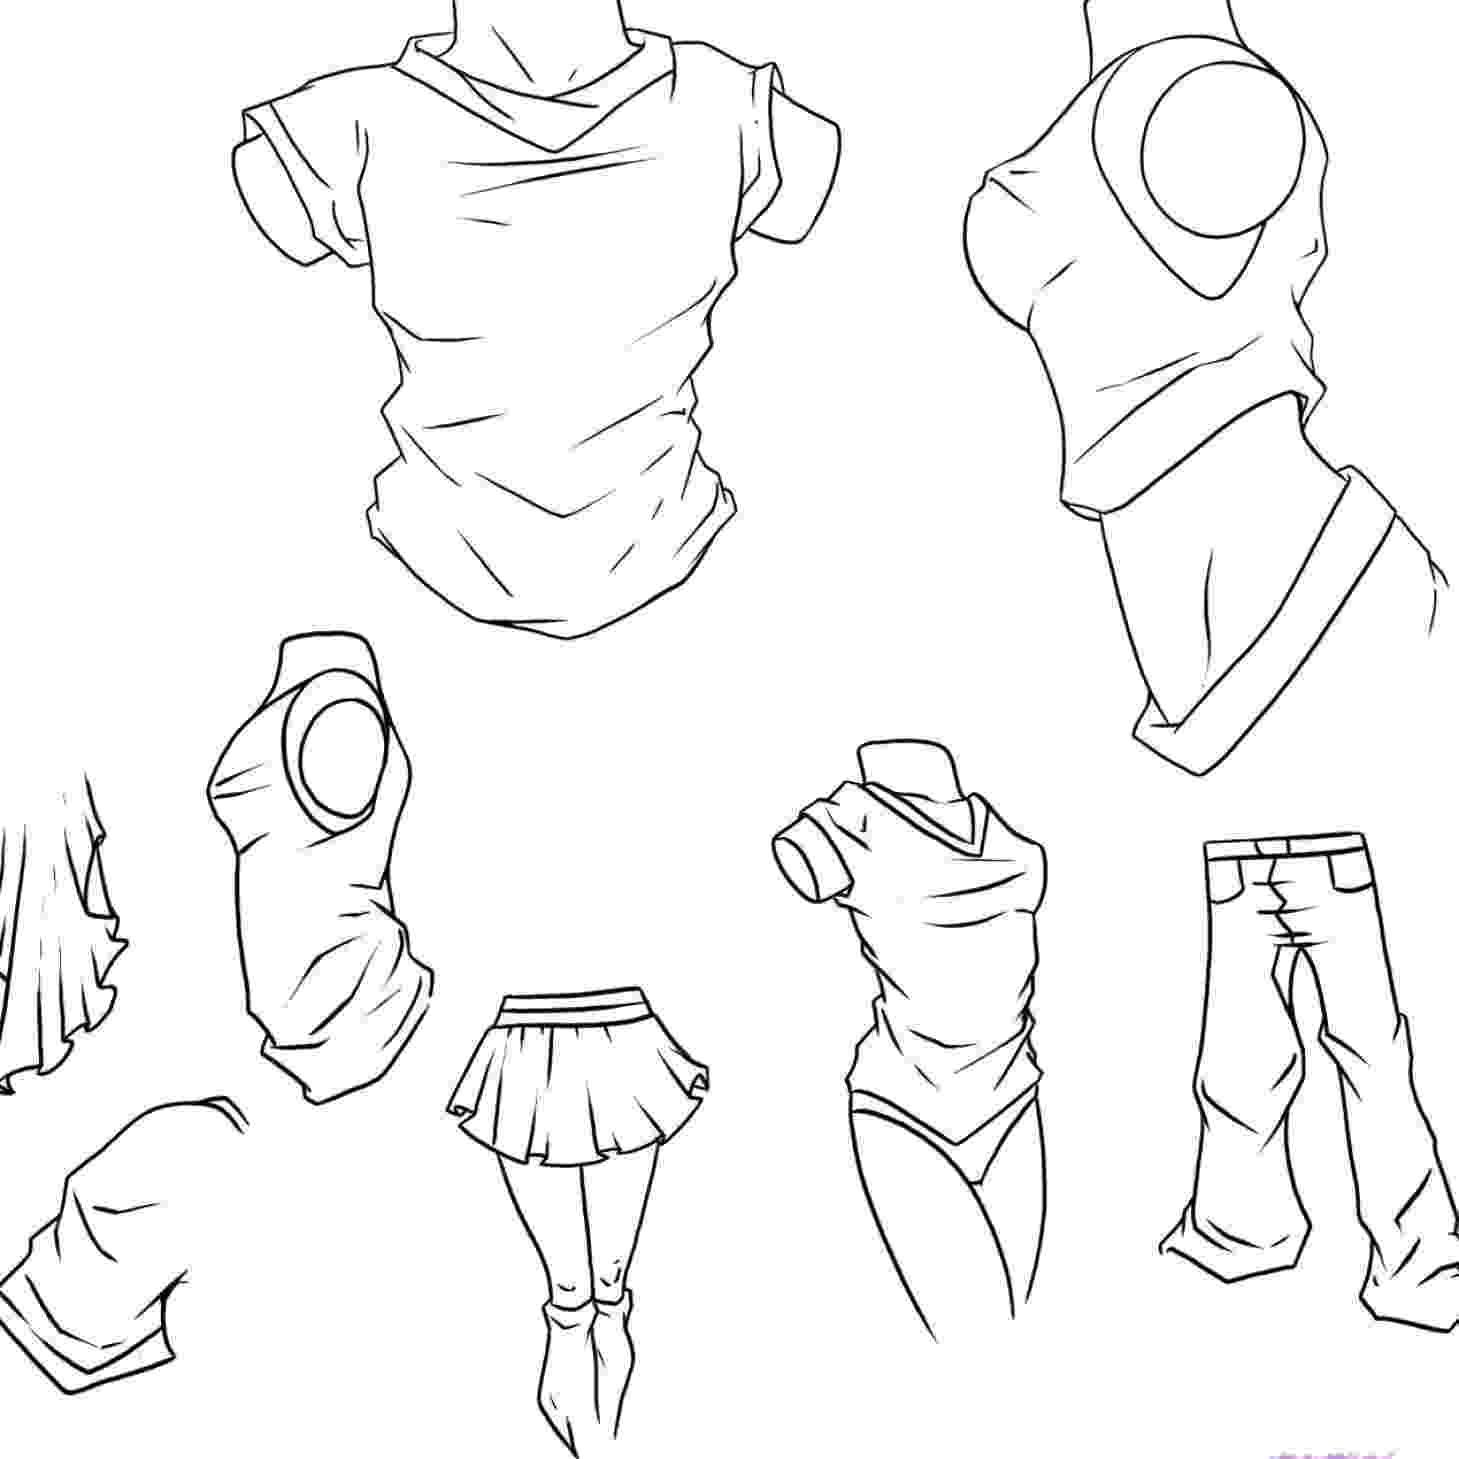 anime tutorials 1000 images about base model manga tutorial on tutorials anime